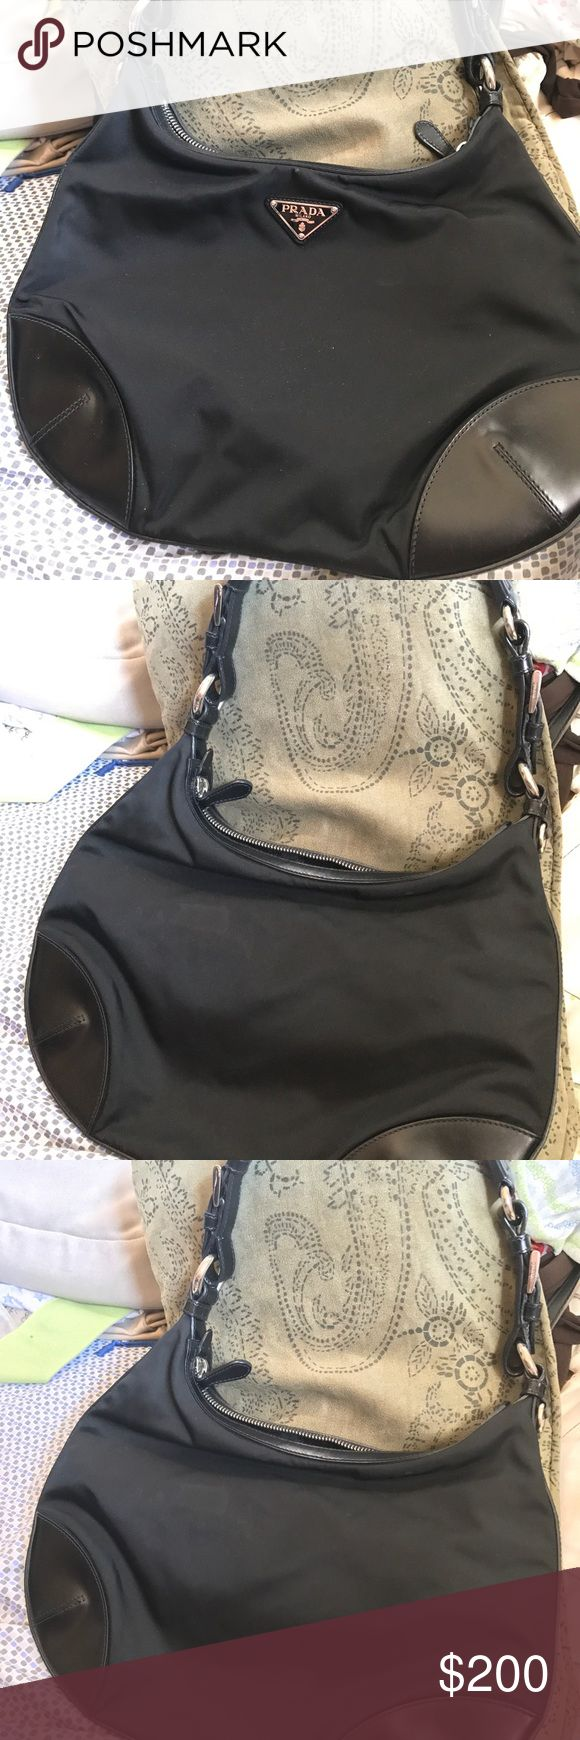 Black Prada Purse Black Prada purse. Practically new, used once. No wear at all. One compartment, one zipper pocket inside. Prada Bags Shoulder Bags